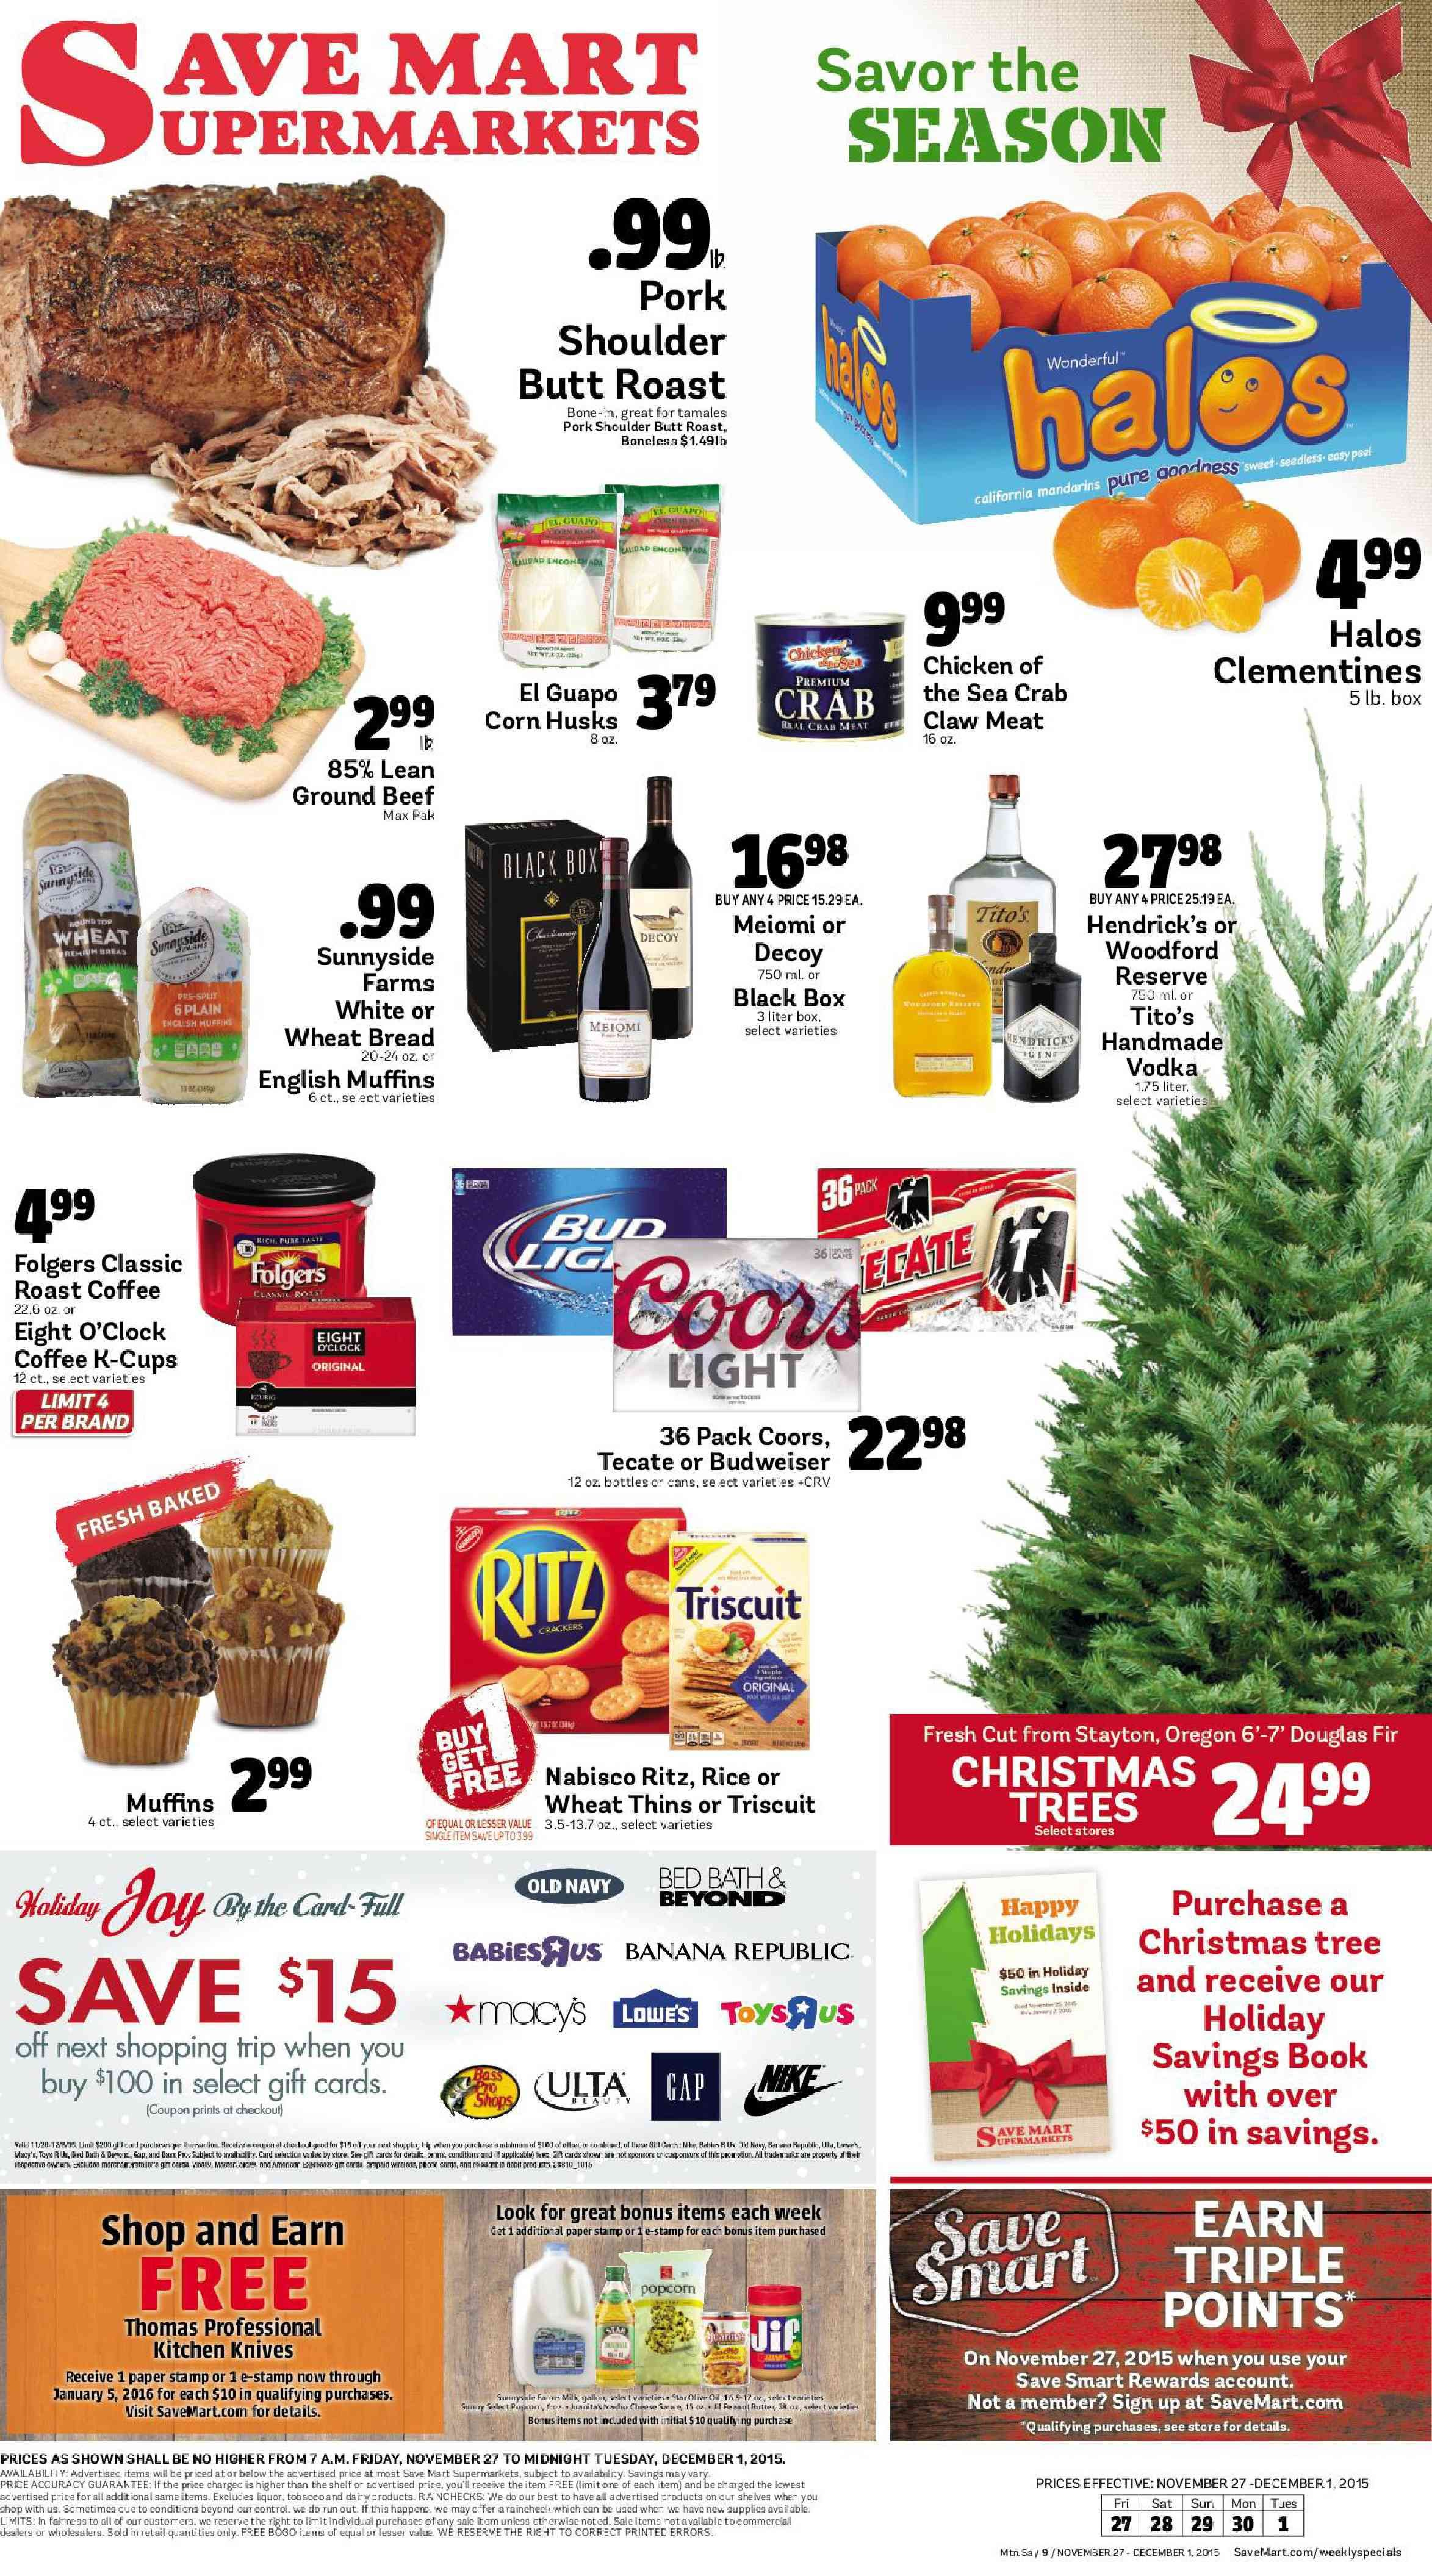 Save Mart Christmas Trees 2020 Pin on OLCatalog.Weekly Ads